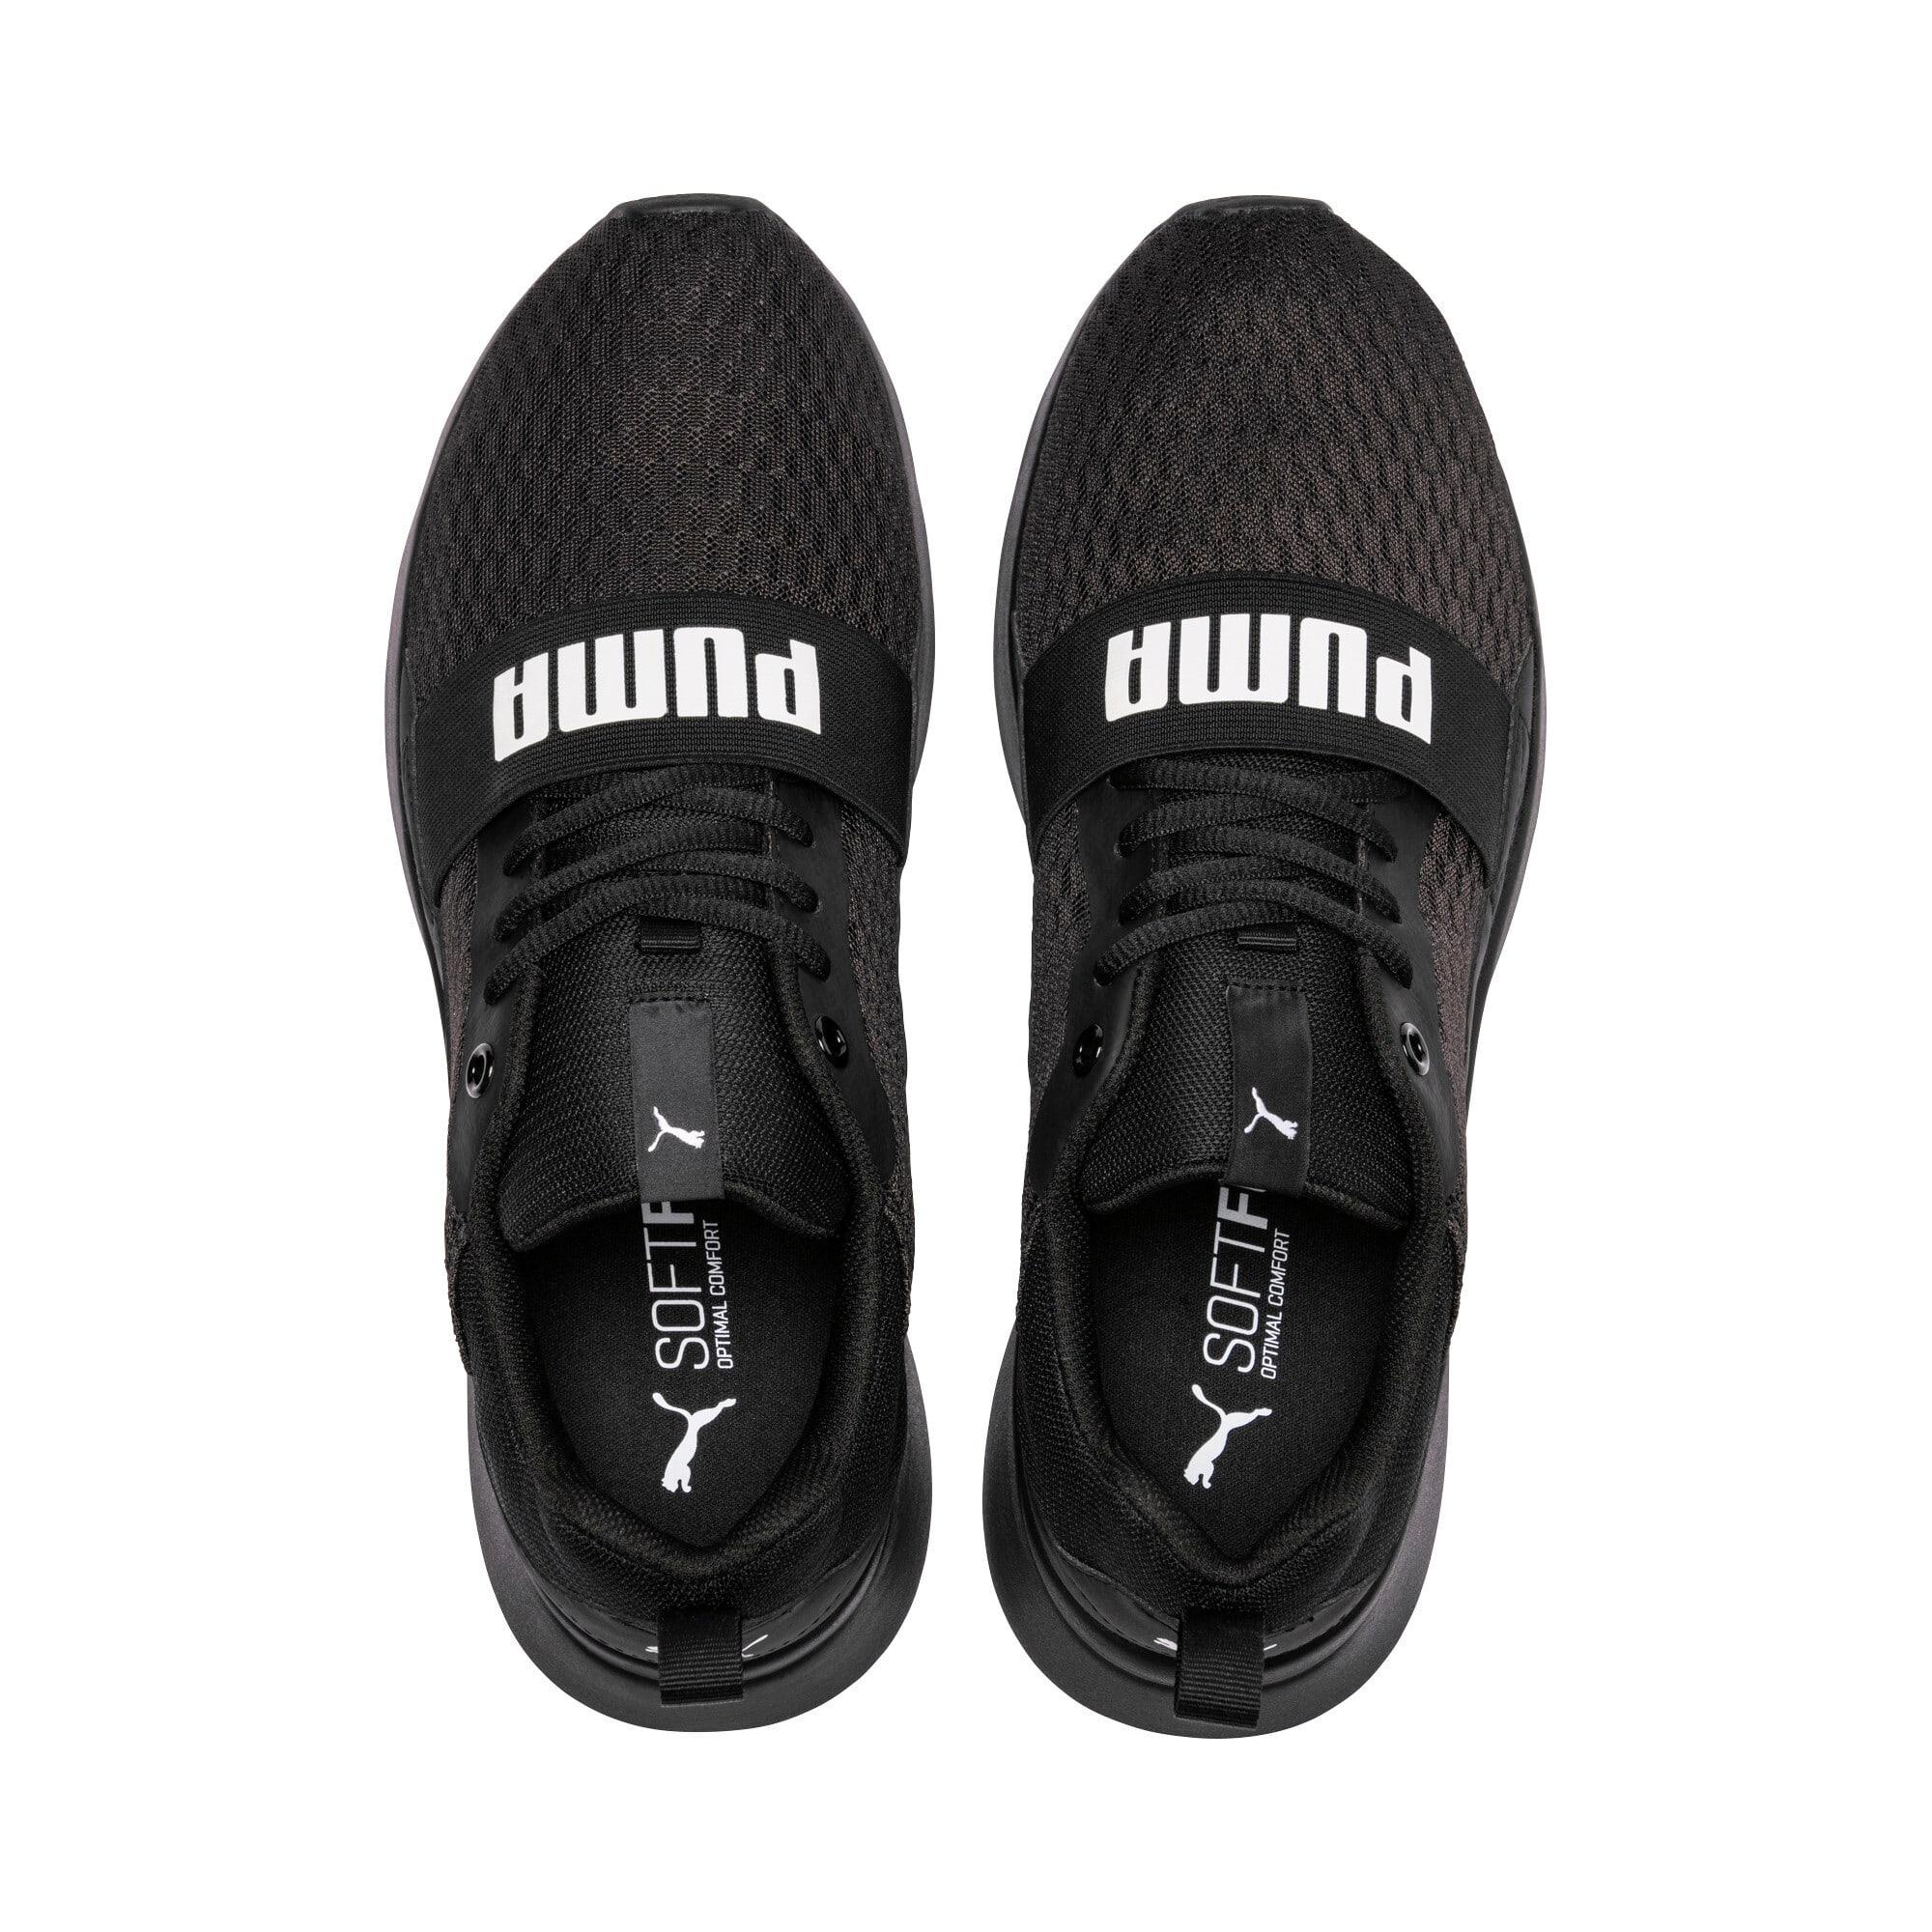 Thumbnail 6 of Wired Trainers, Puma Black-Puma Black- Black, medium